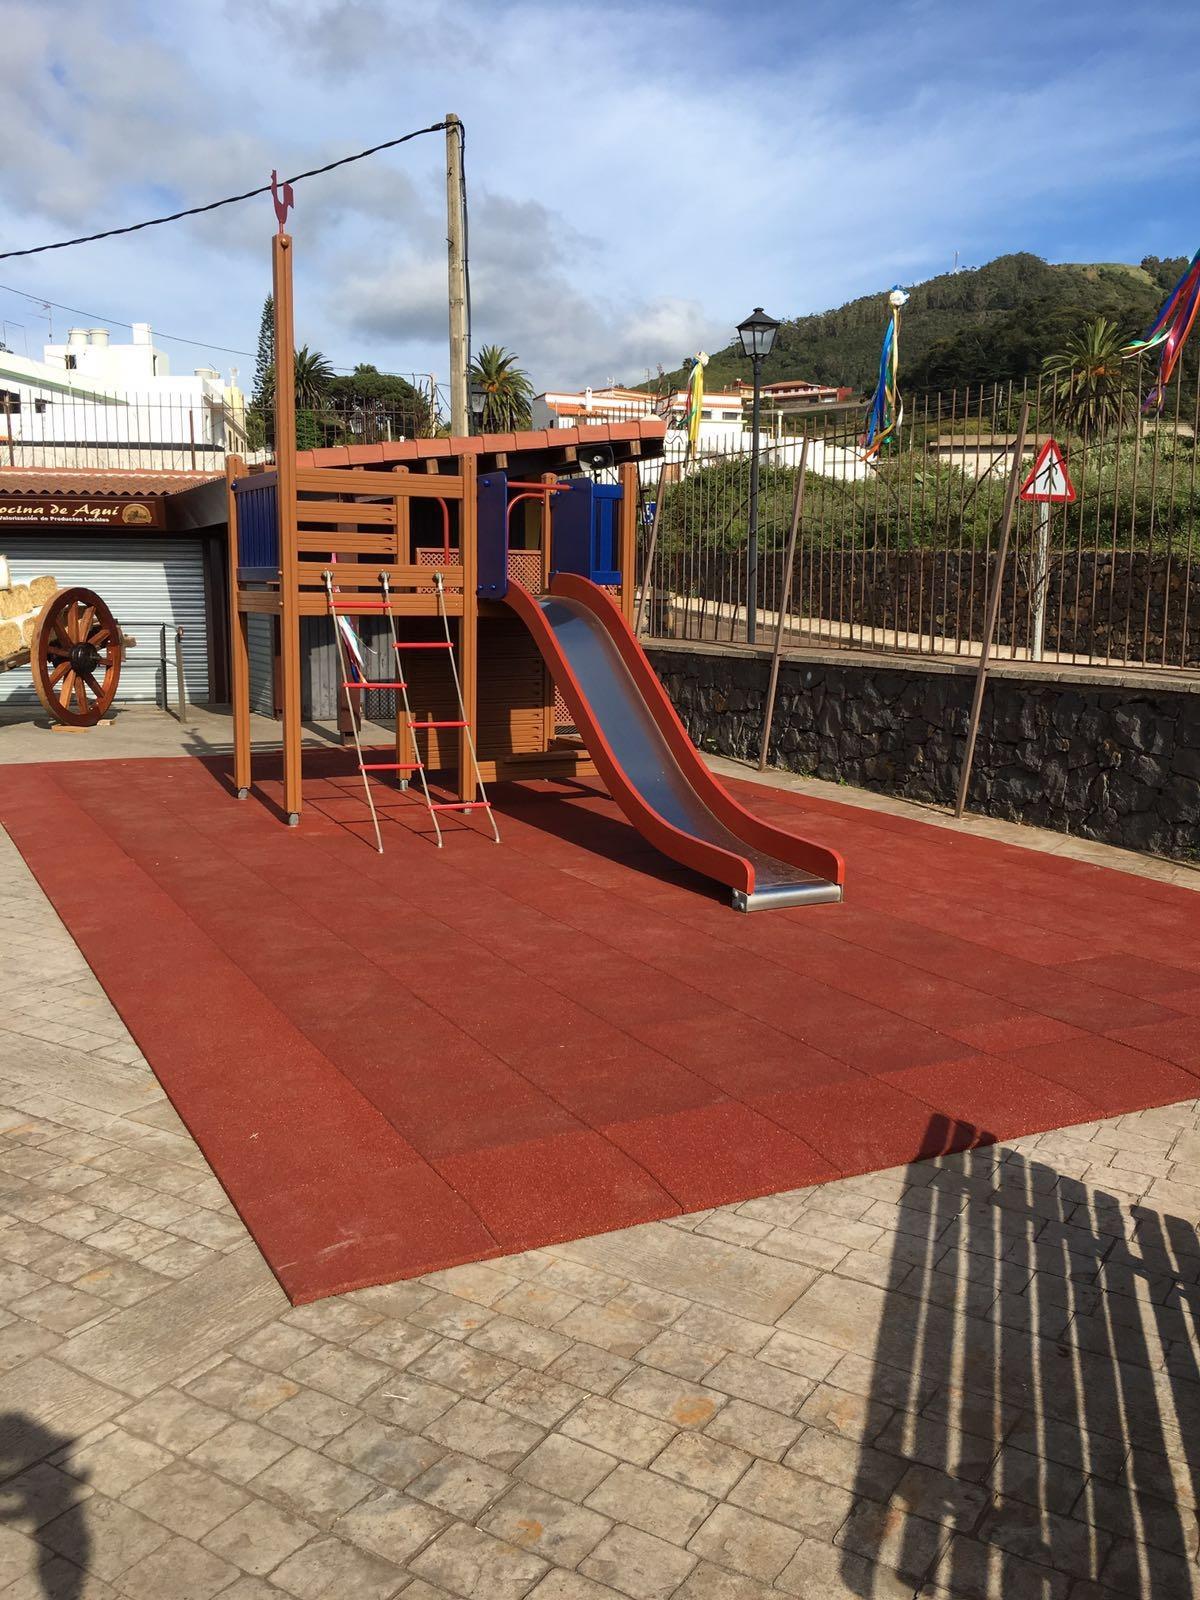 Parque infantil Mercado del Agricultor de Tegueste